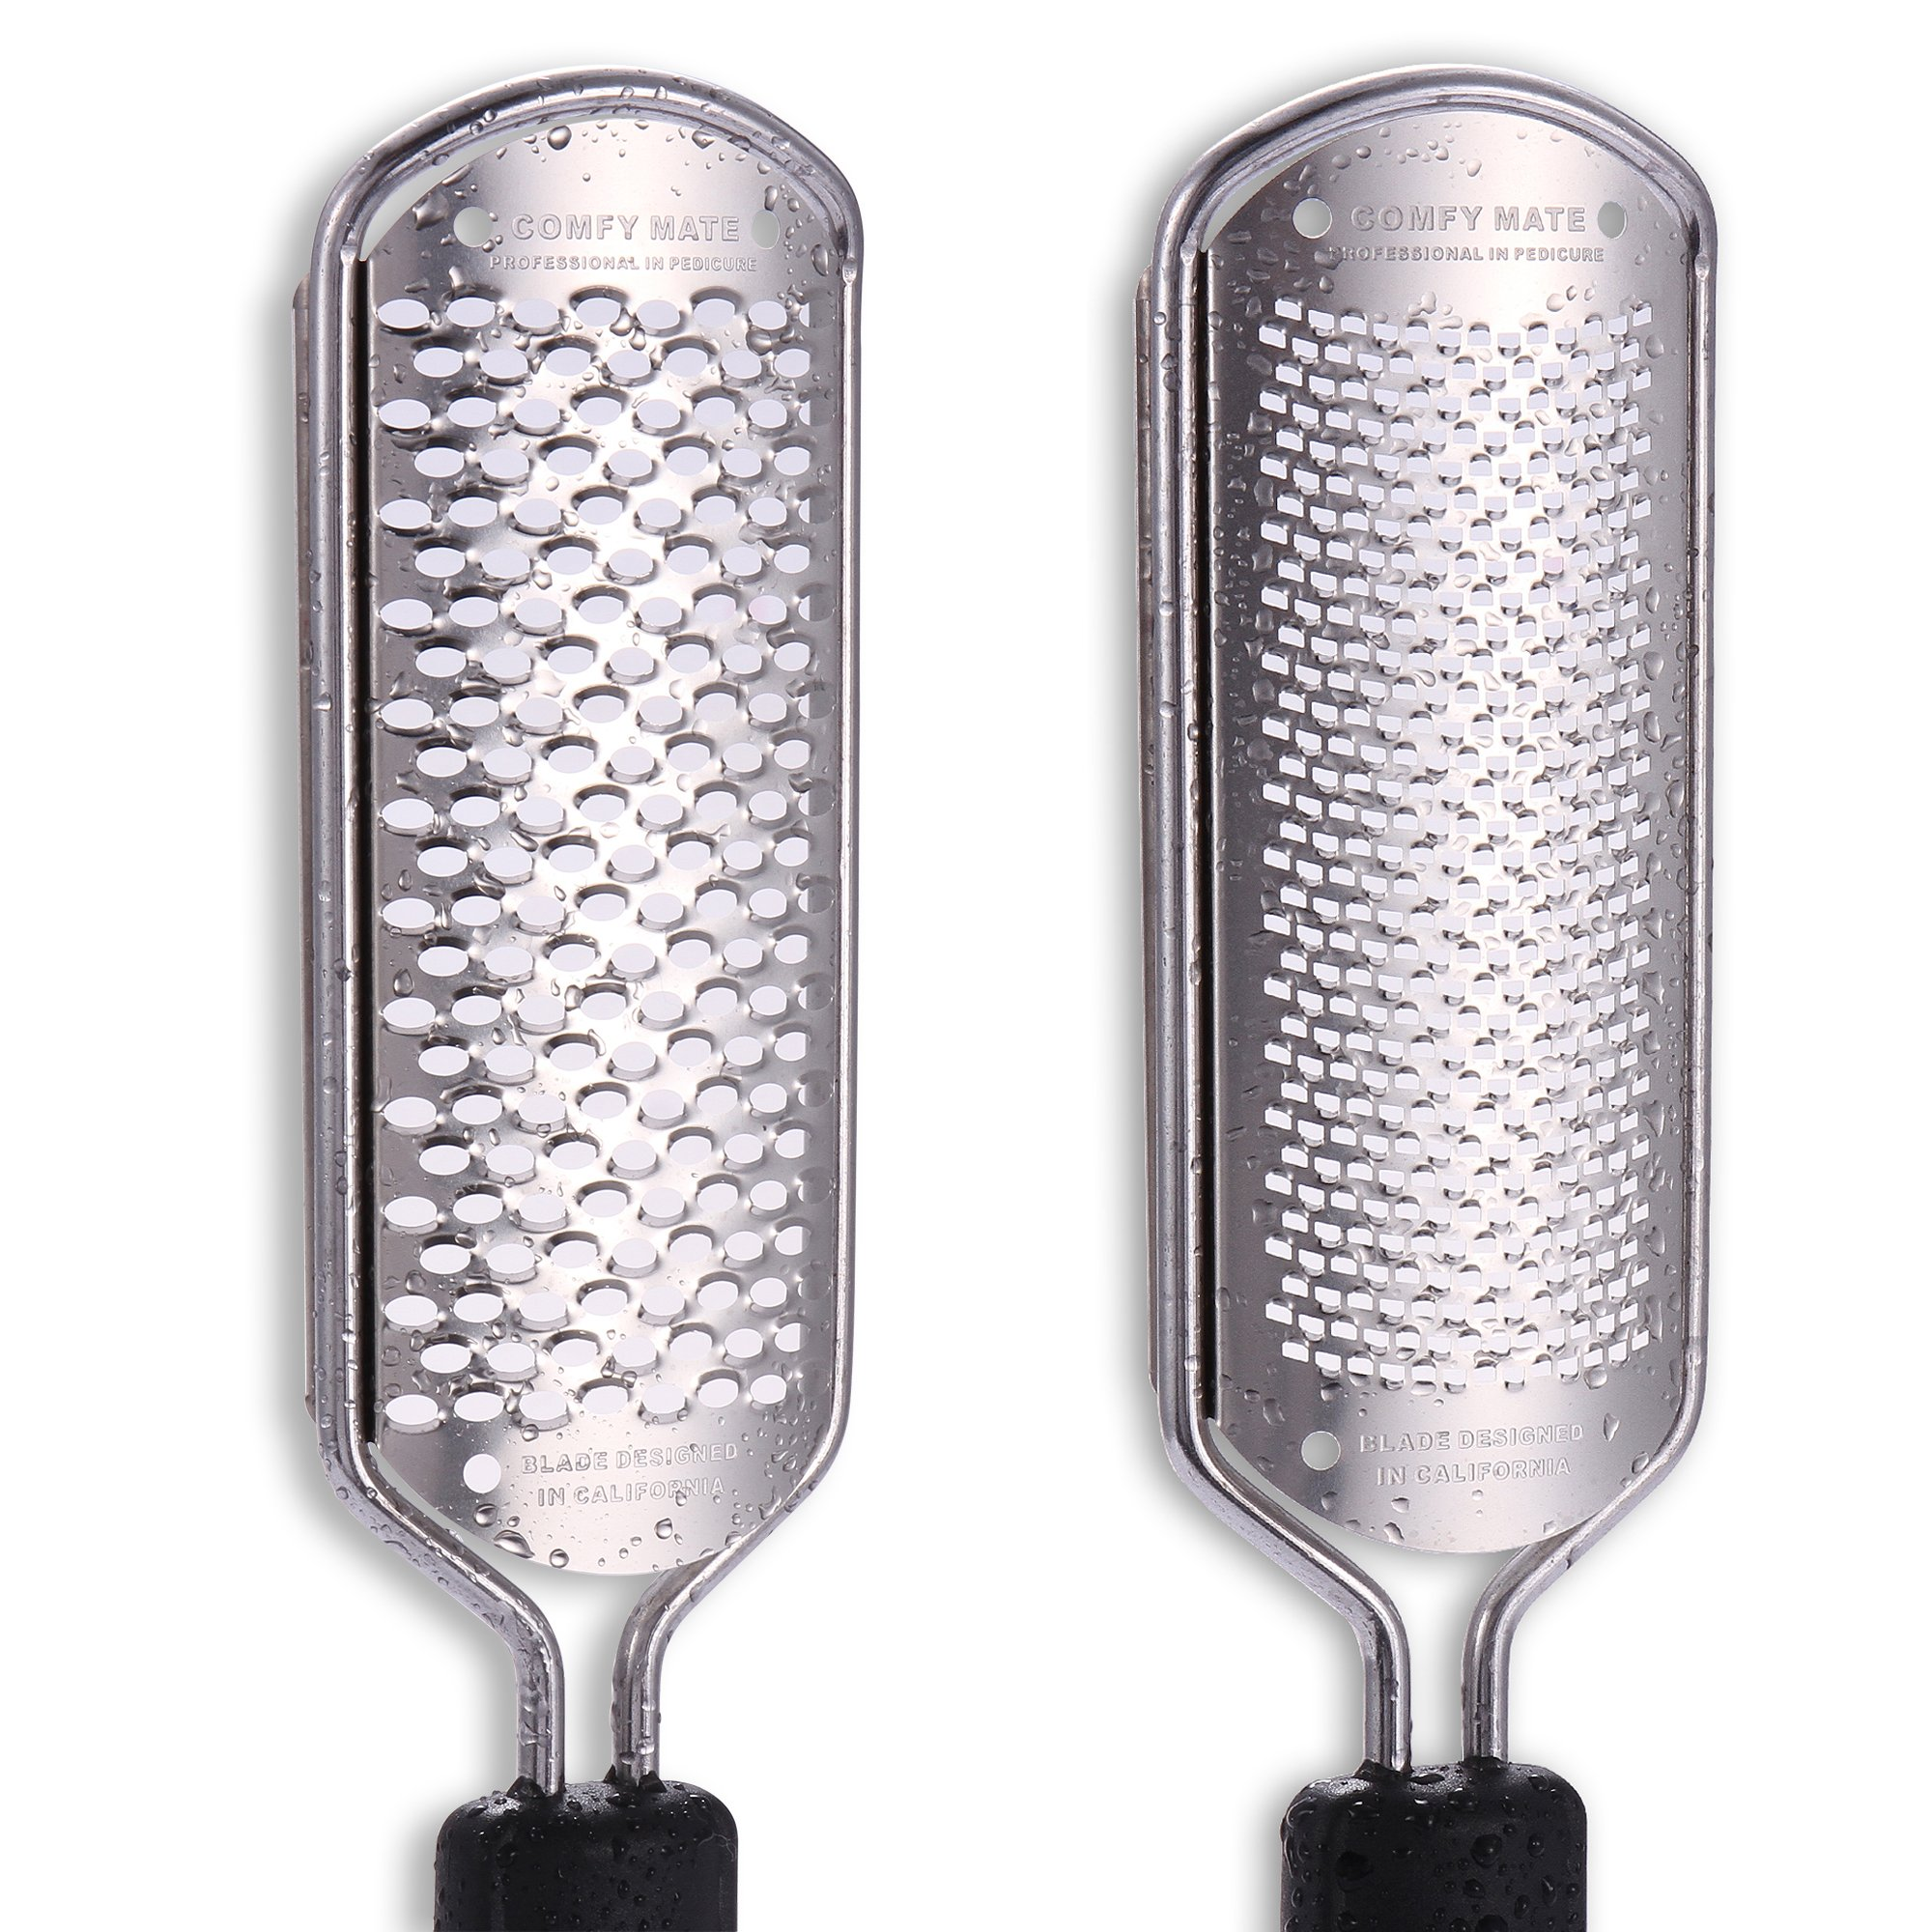 Best Deal 2 Blades Pedicure Foot File Scrubber Rasp Feet Callus Shaver Cuticle Cutter and Corn Remover Pedi tool (2 Blades)